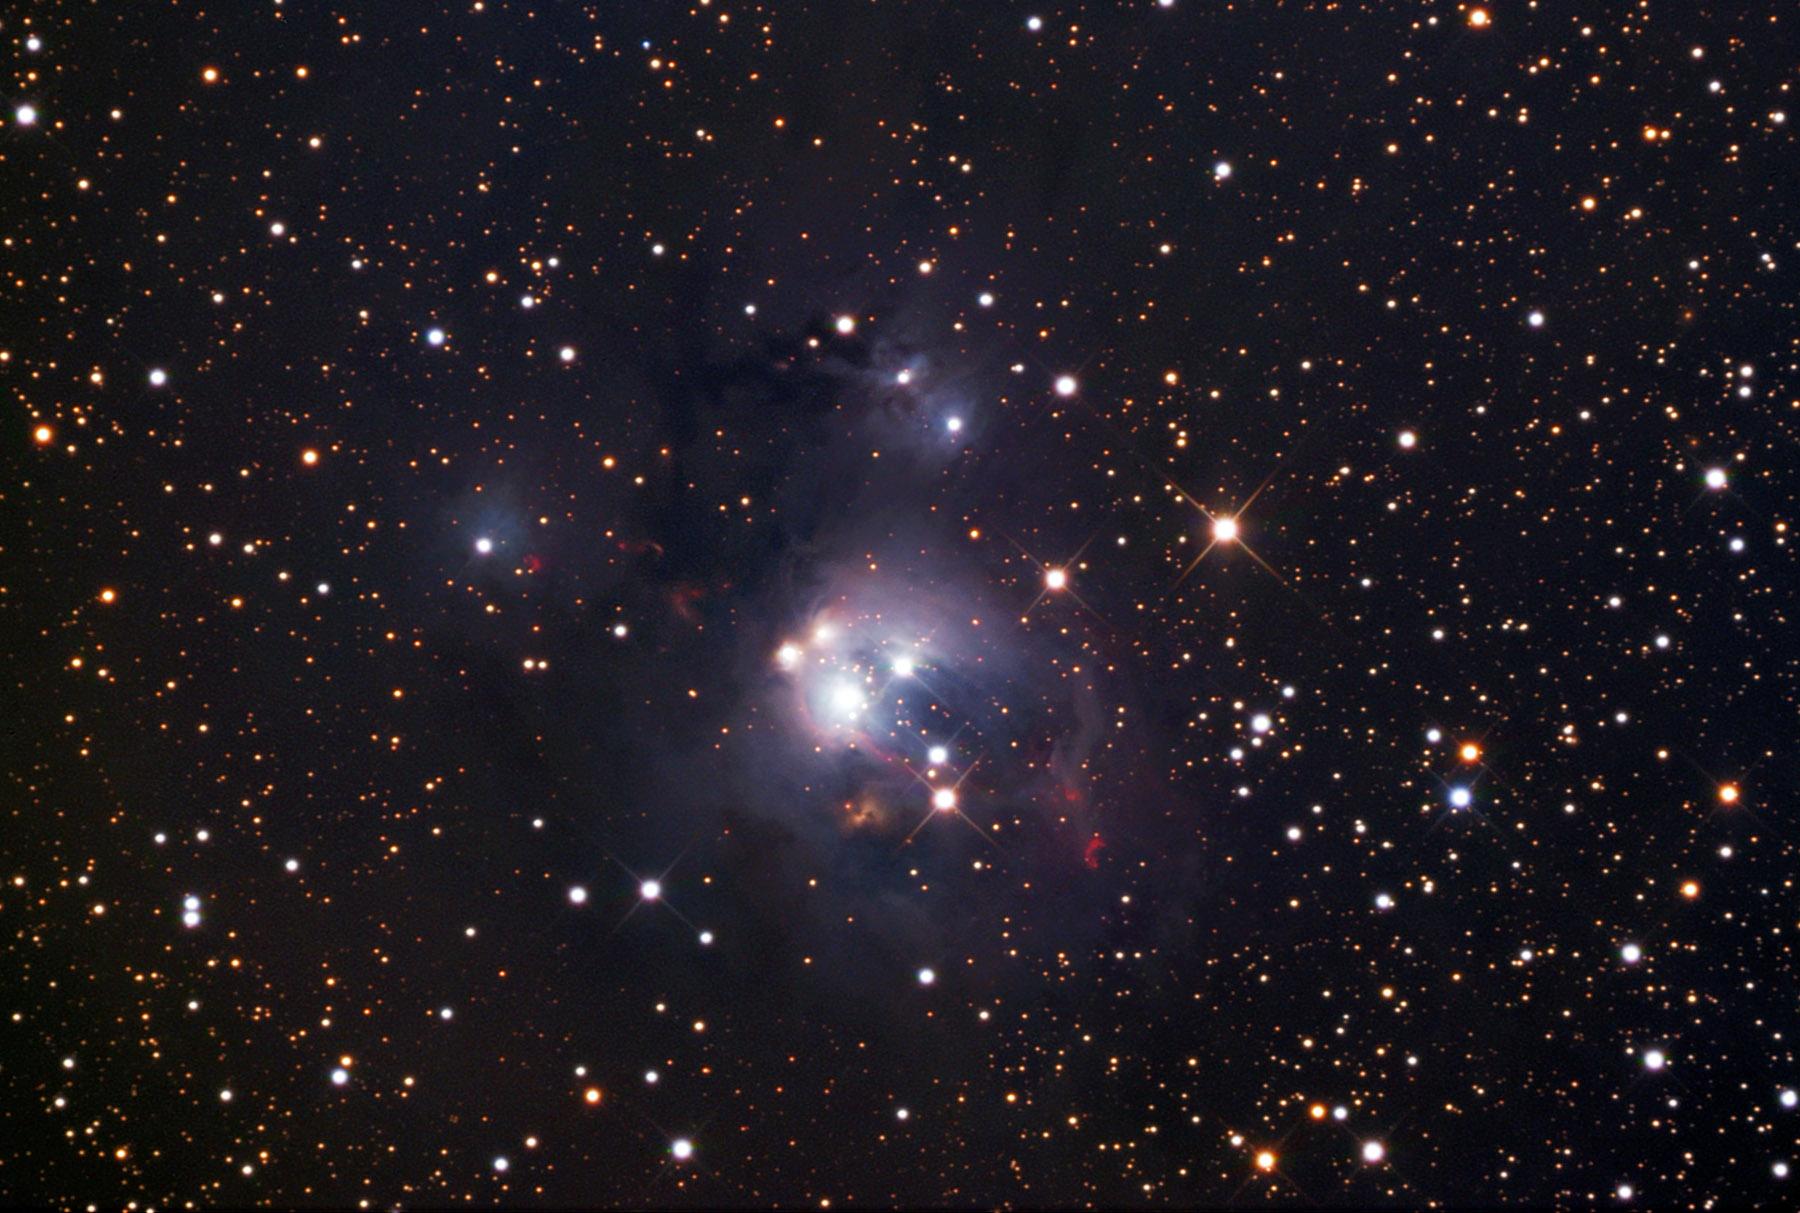 Sebesar Apa Kita di Alam Semesta  Info Astronomy